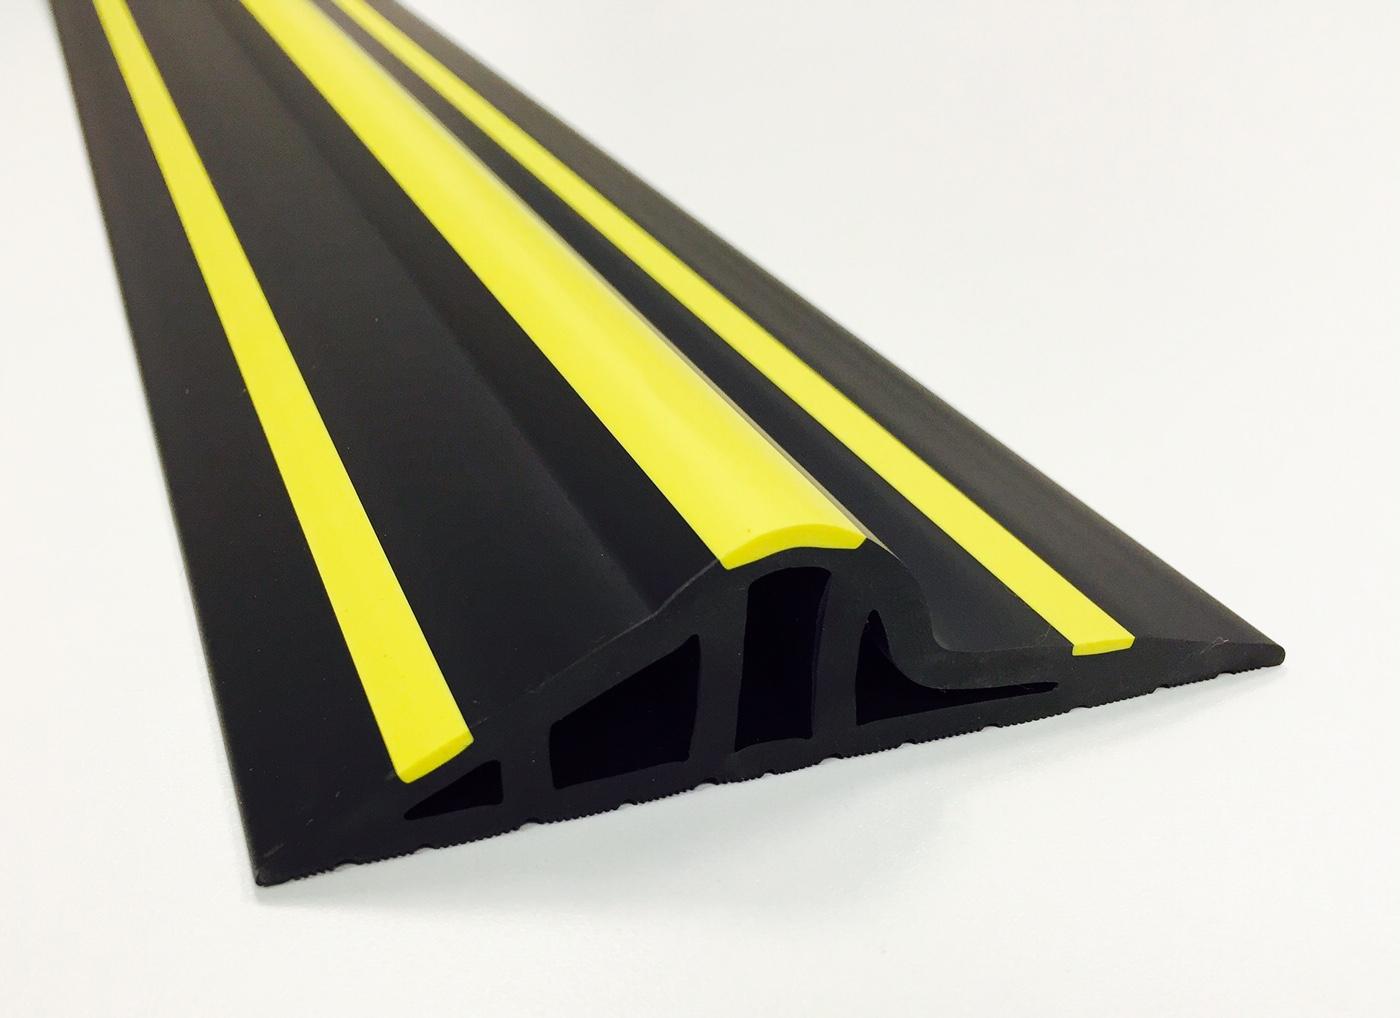 30mm Black Yellow Rubber Garage Threshold Seal Garage